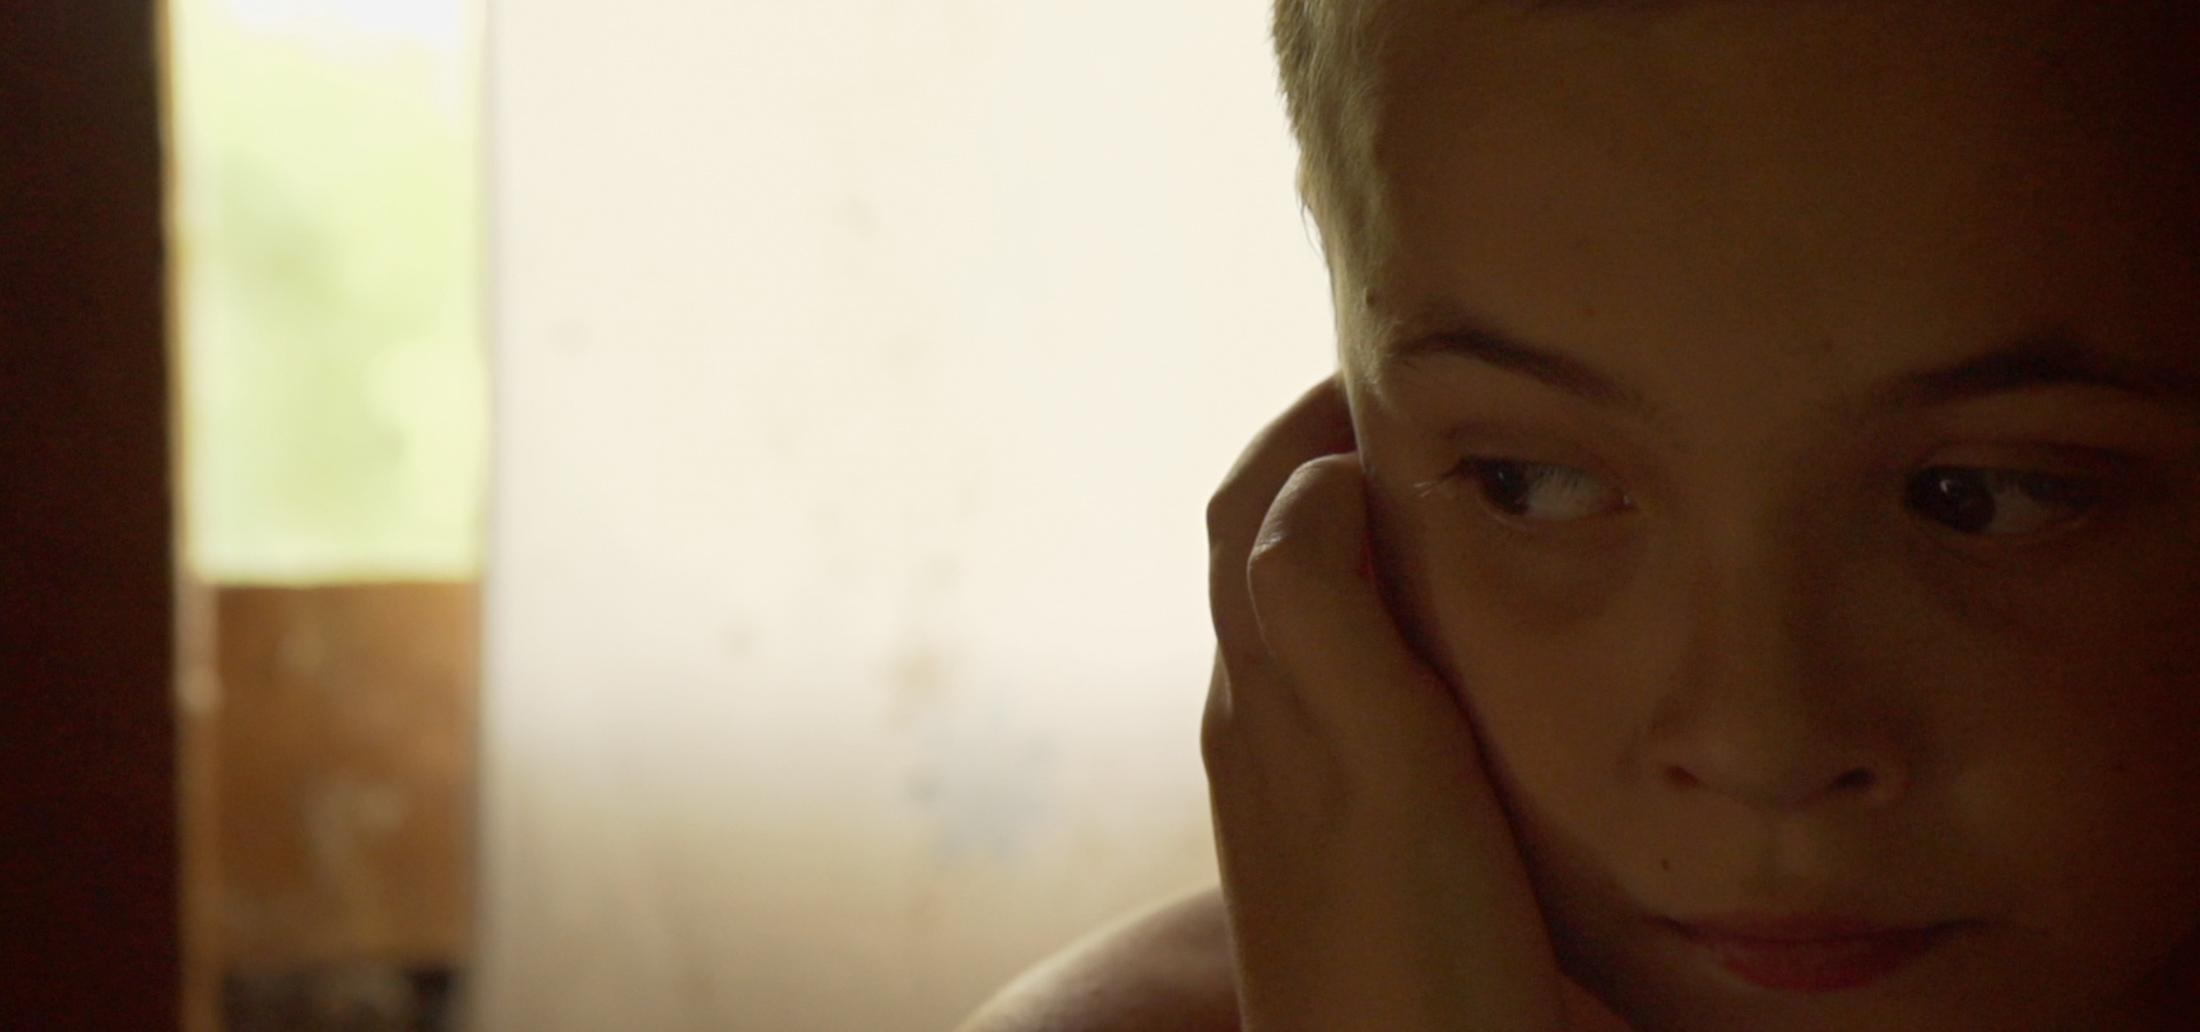 What causes autism What this amazing film called Unlocking